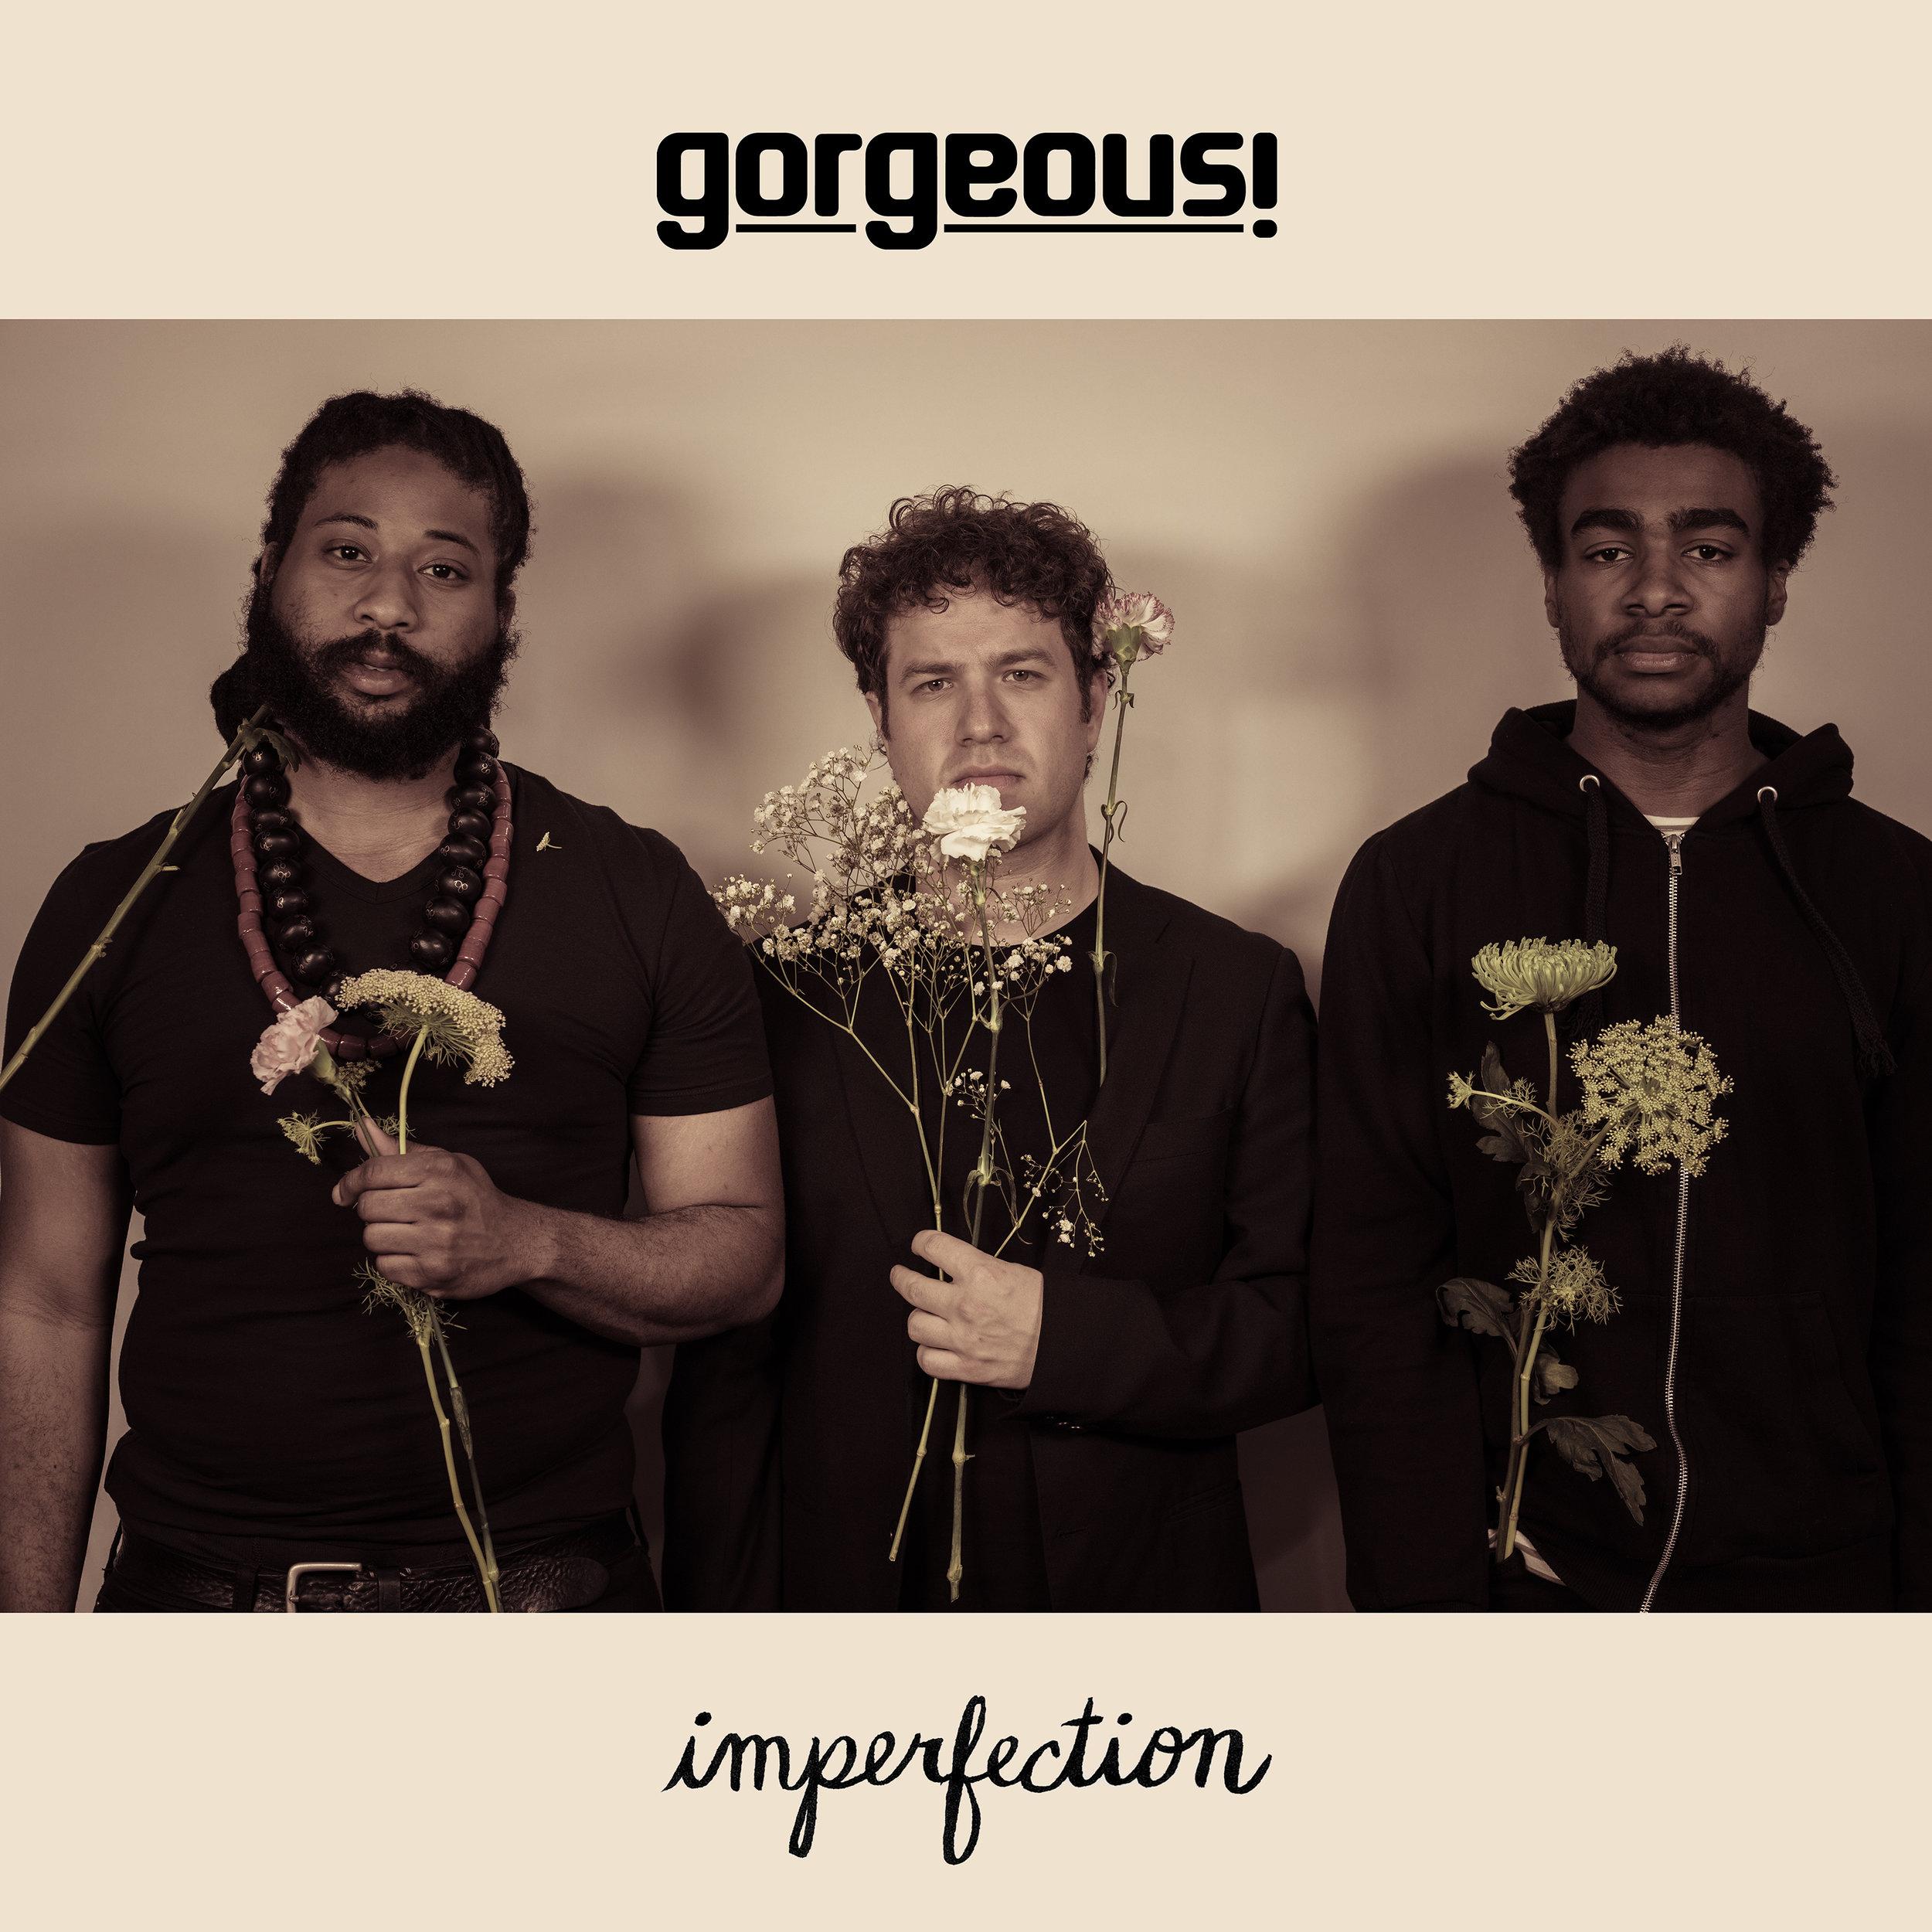 Gorgeous LP Album Art - 3000px - 2019 01 15.jpg